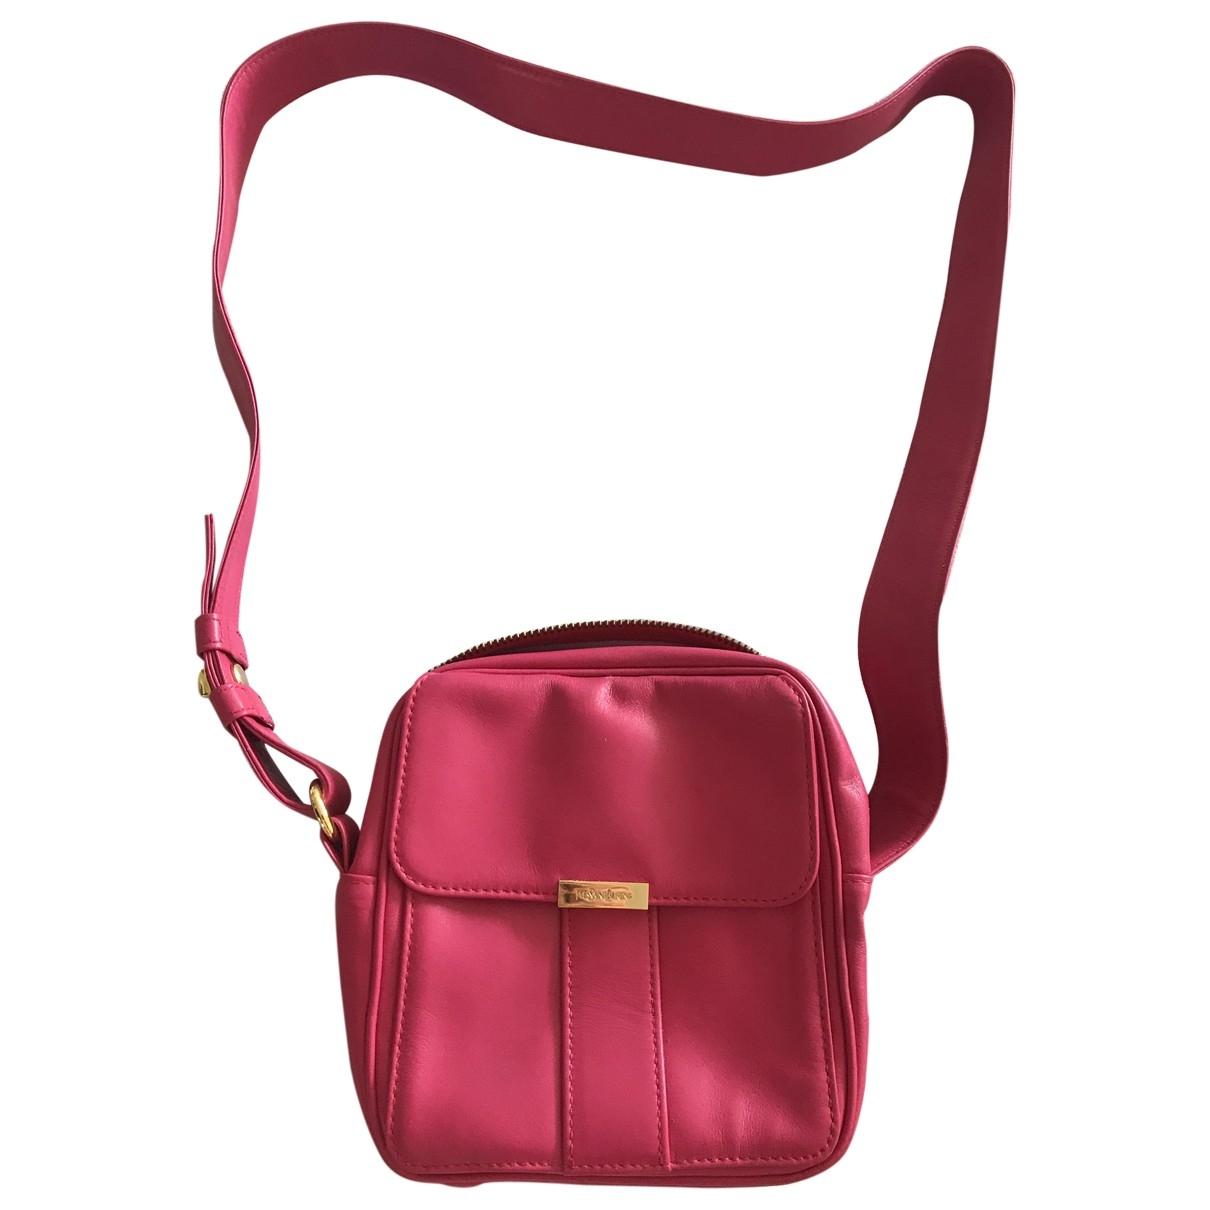 Yves Saint Laurent \N Pink Leather handbag for Women \N